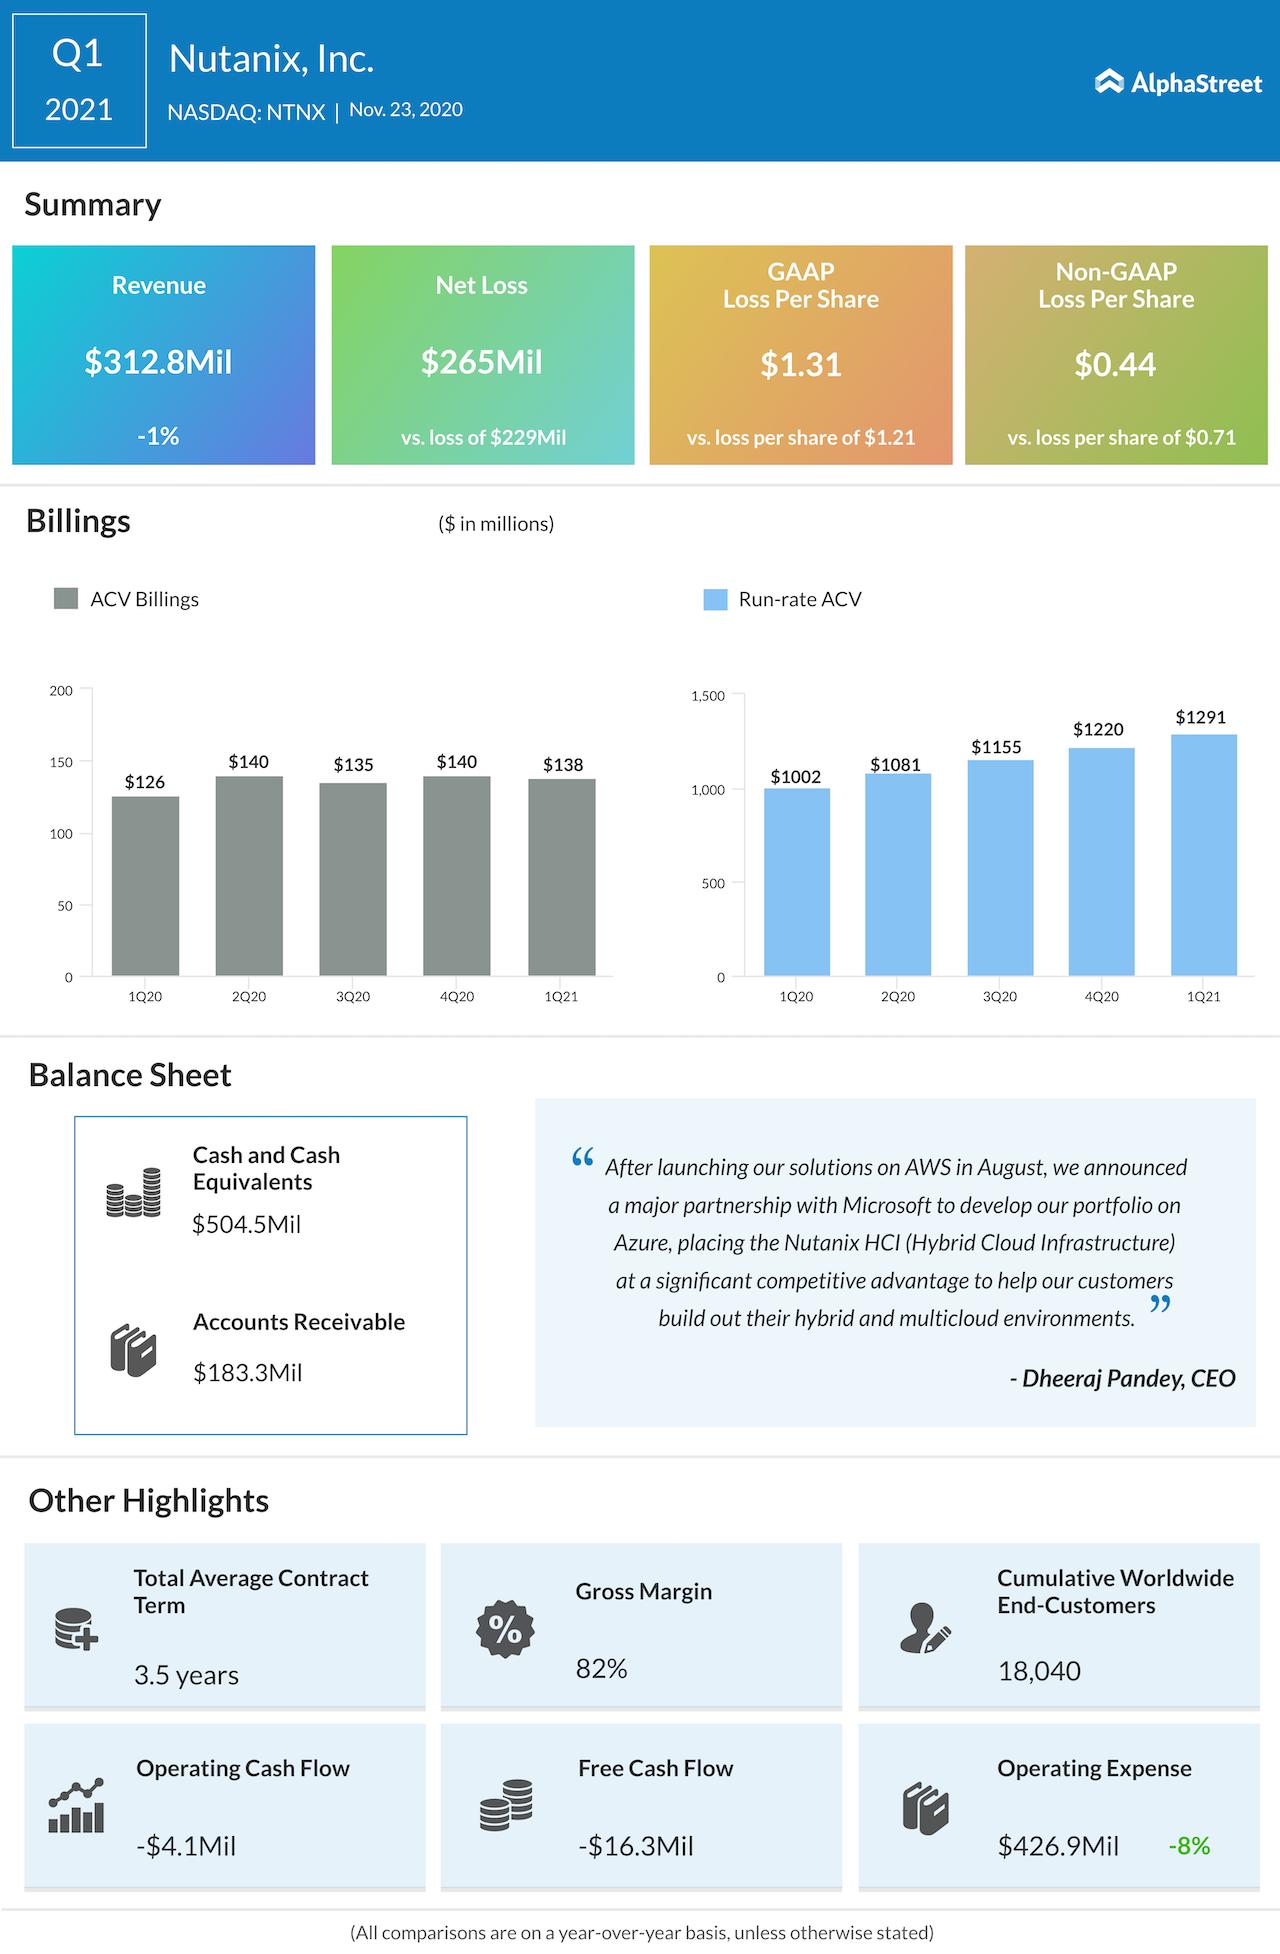 Nutanix Q1 2021 earnings